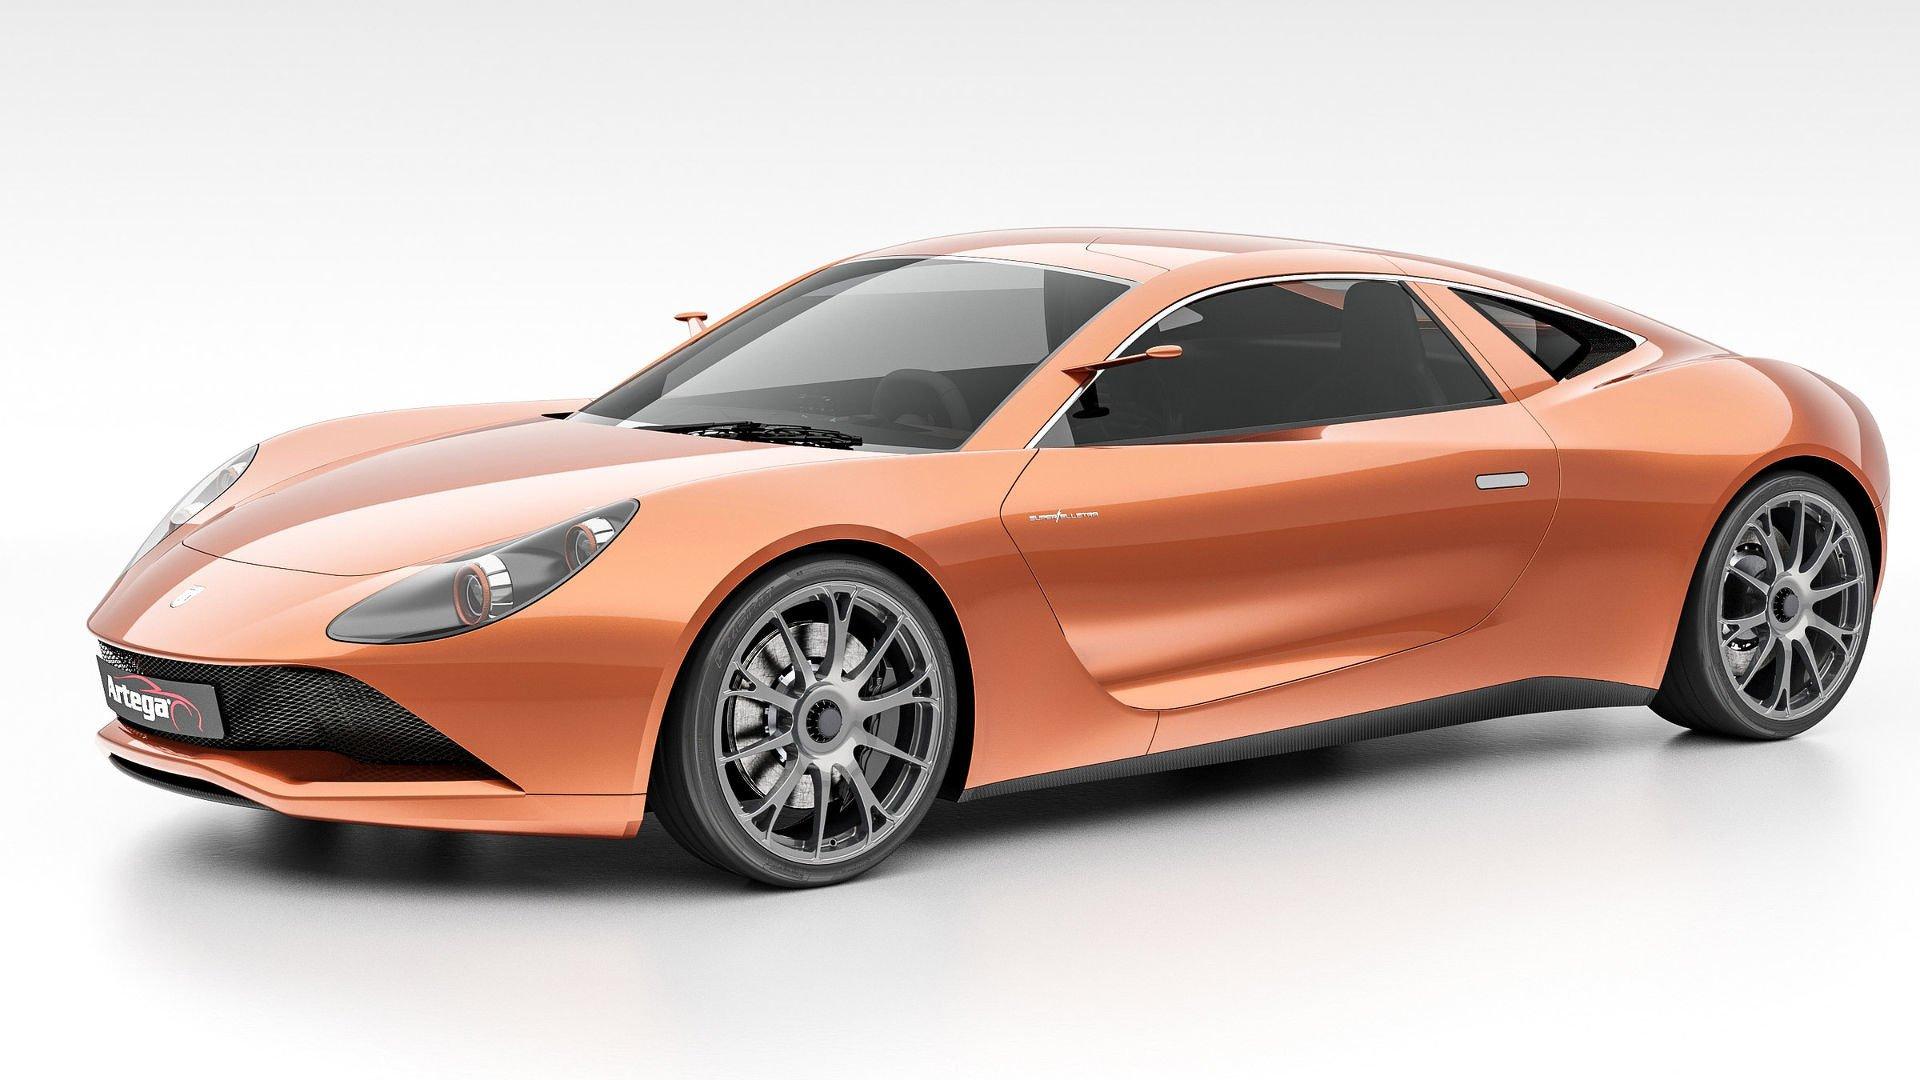 Electric Car Range >> Artega Scalo Superelletra – 1,020 hp, all-electric three-seater supercar with a 500 km operating ...